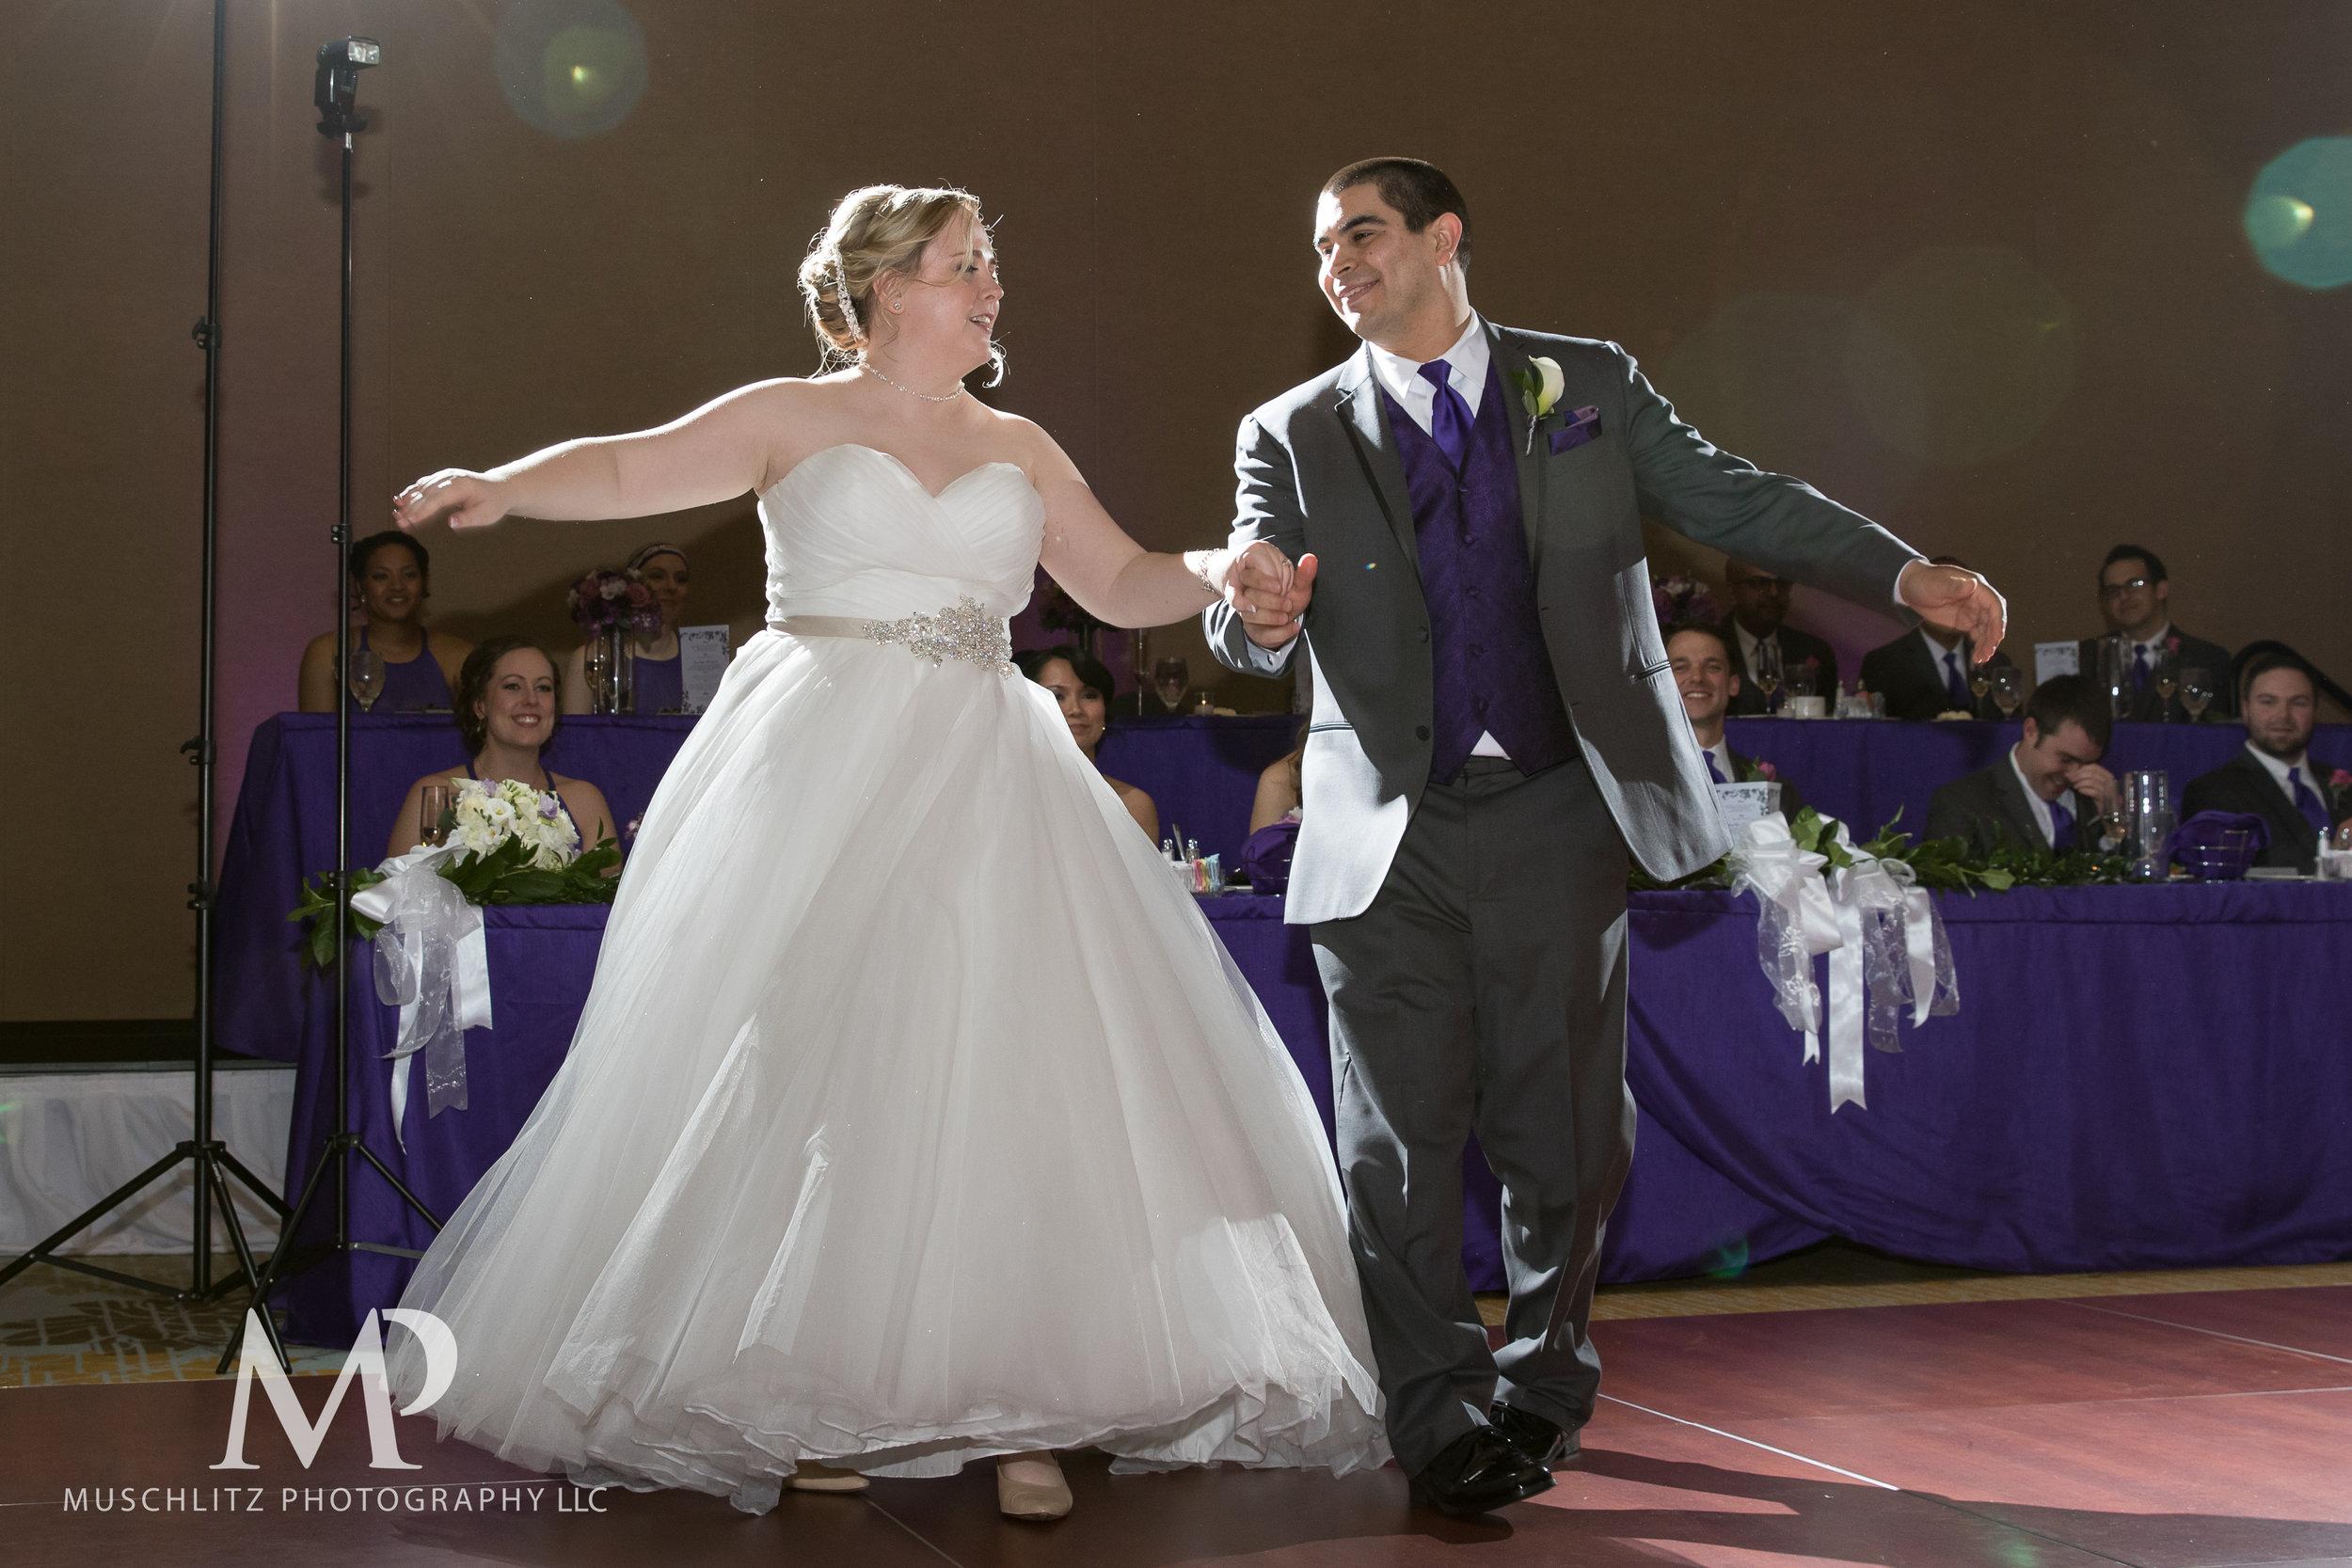 hilton-polaris-wedding-columbus-ohio-muschlitz-photography-018.JPG